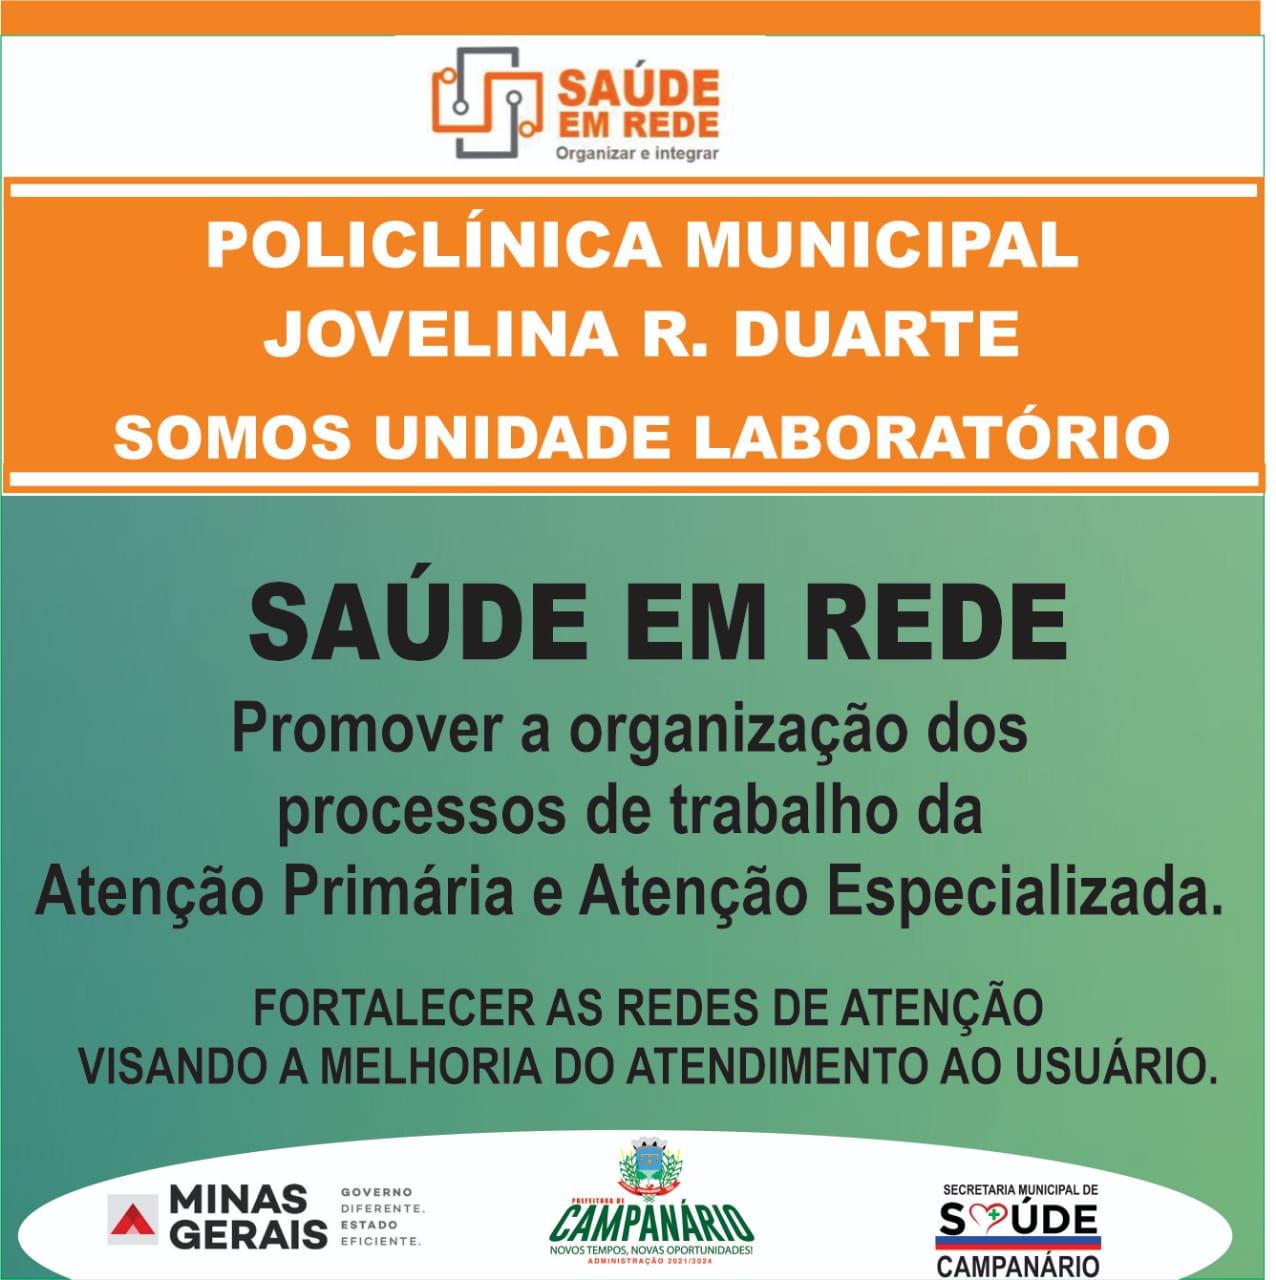 POLICLÍNICA MUNICIPAL JOVELINA R. DUARTE